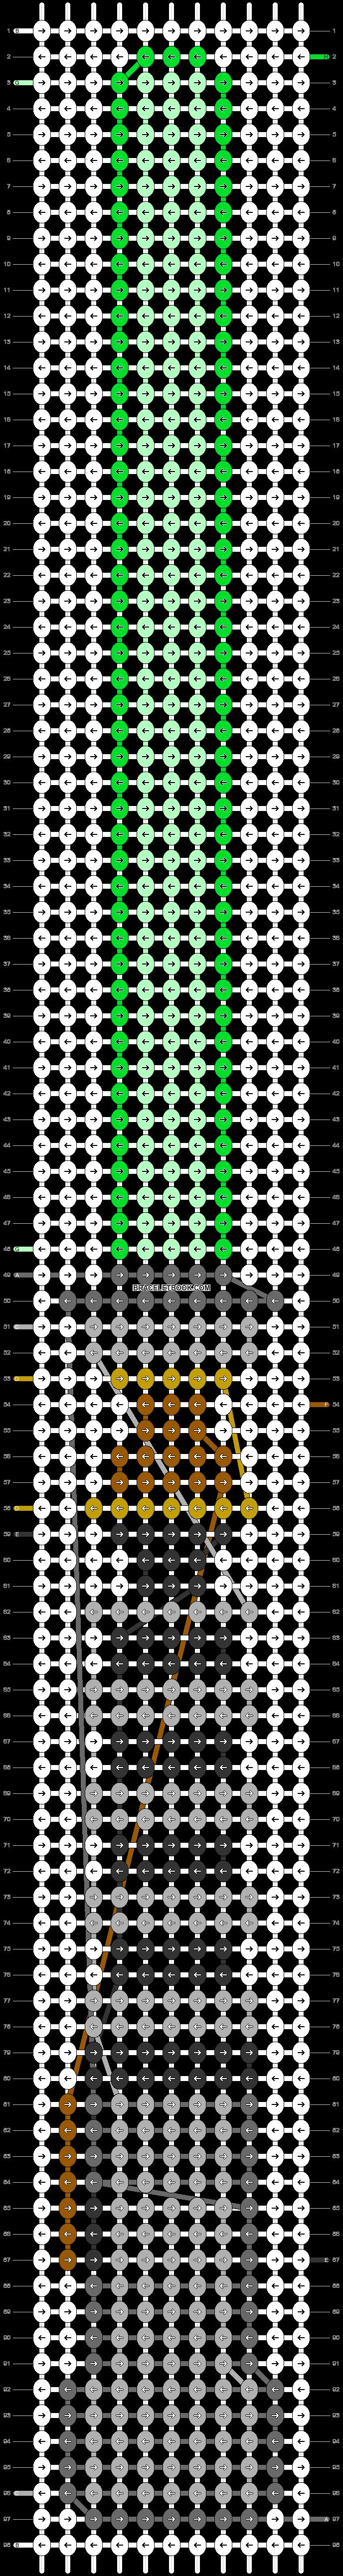 Alpha pattern #38115 pattern